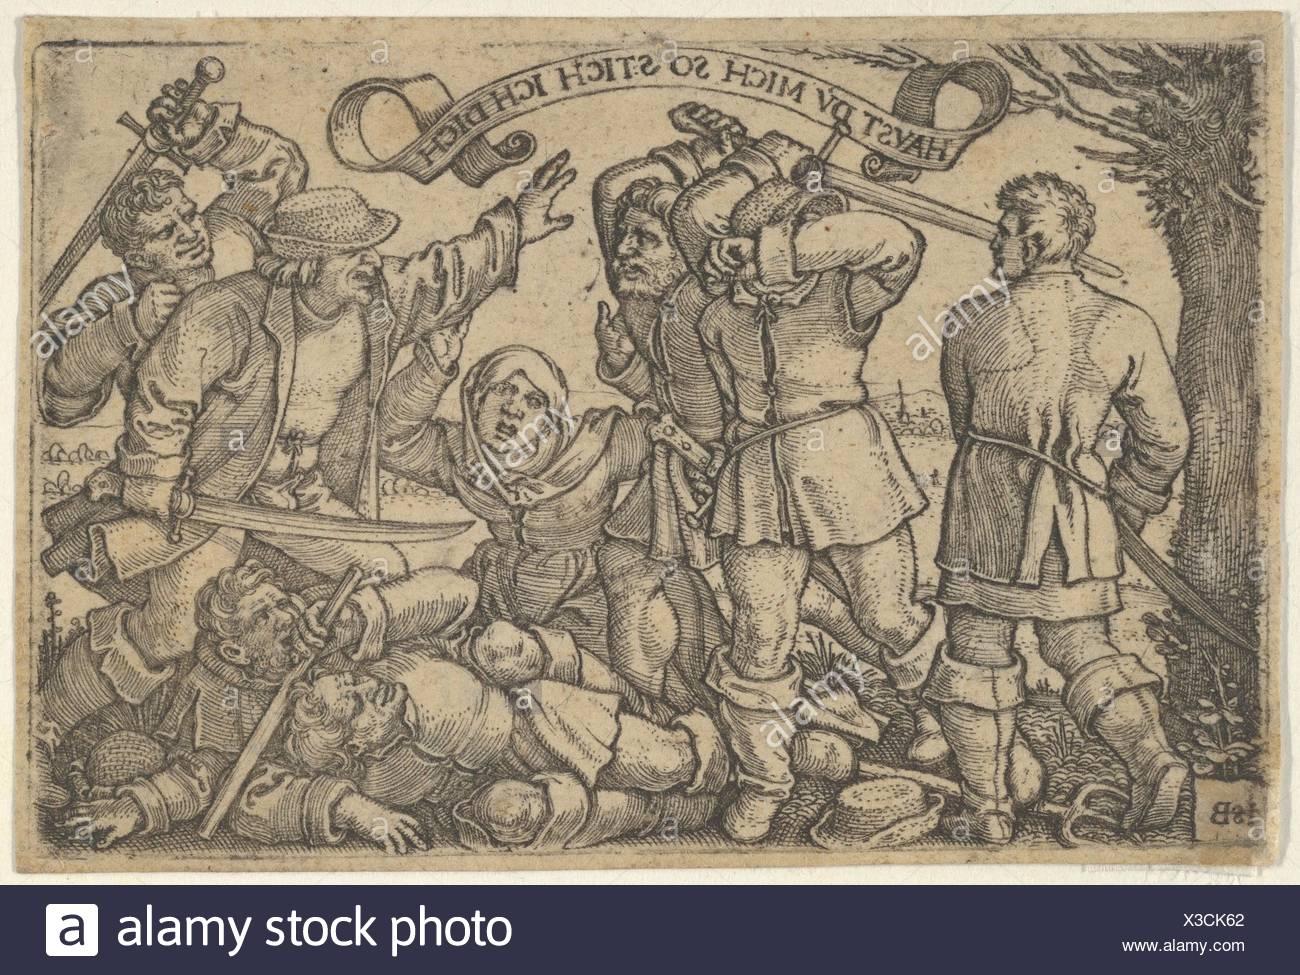 Artist: Sebald Beham (German, Nuremberg 1500-1550 Frankfurt); Date: 1531-50;  Medium: Engraving; second state of two (Pauli);